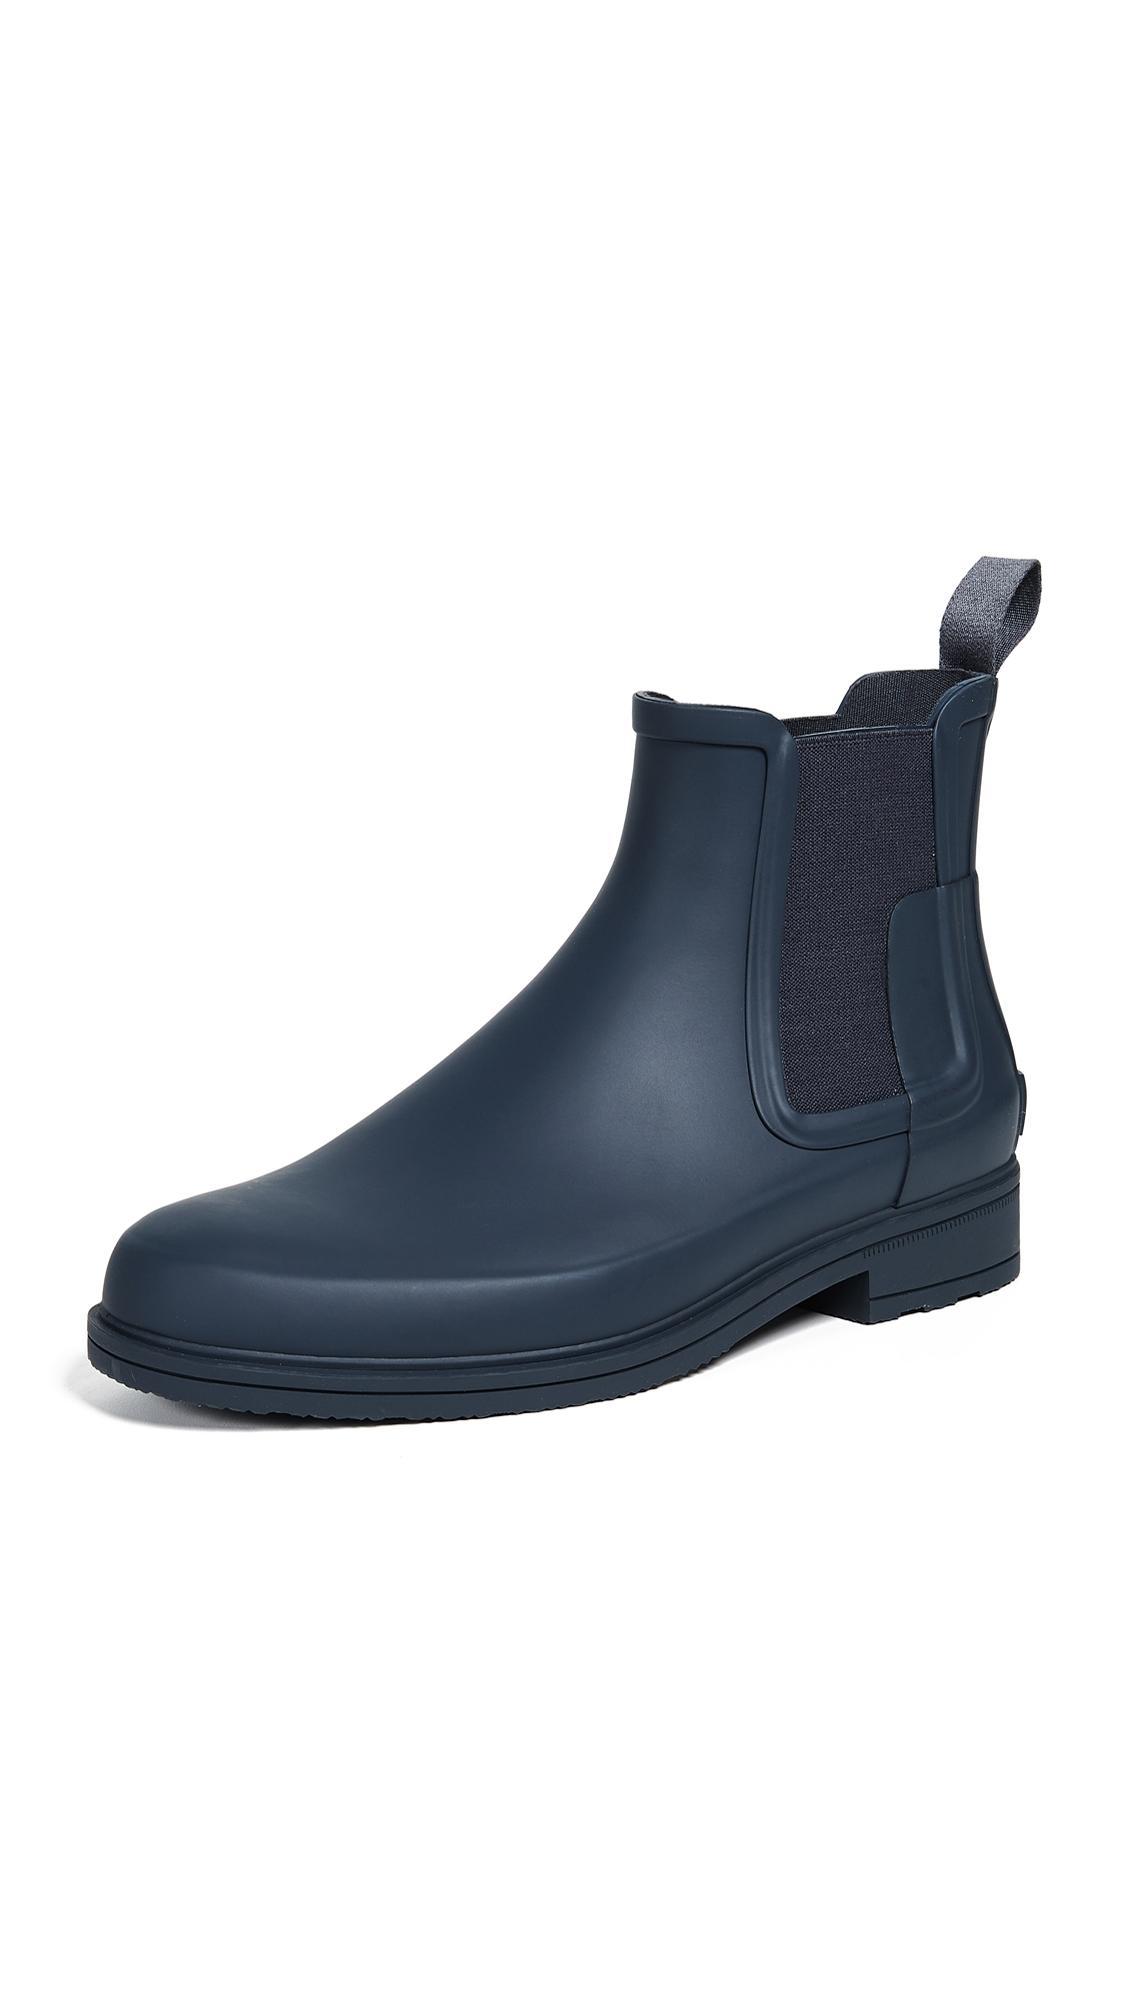 Hunter Men's Original Refined Chelsea Rain Boots In Black